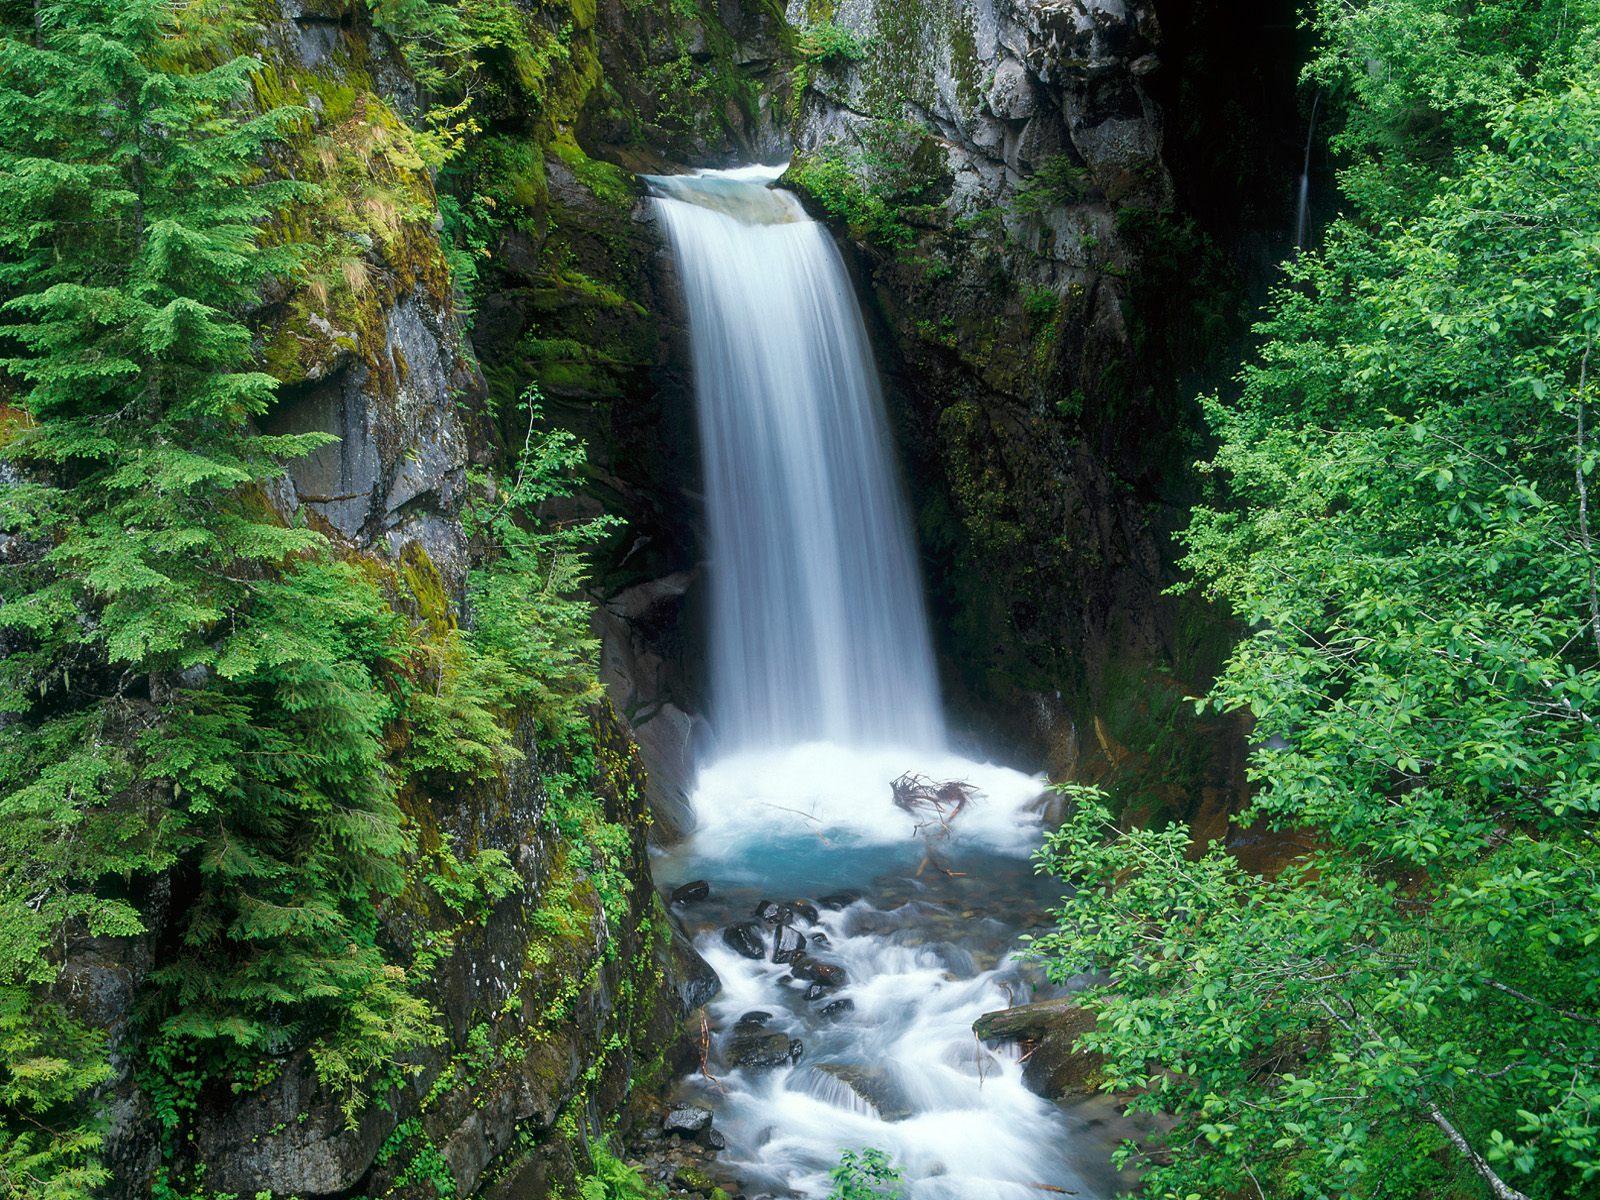 Pemandangan Air Terjun 3 Dunia Pengetahuan